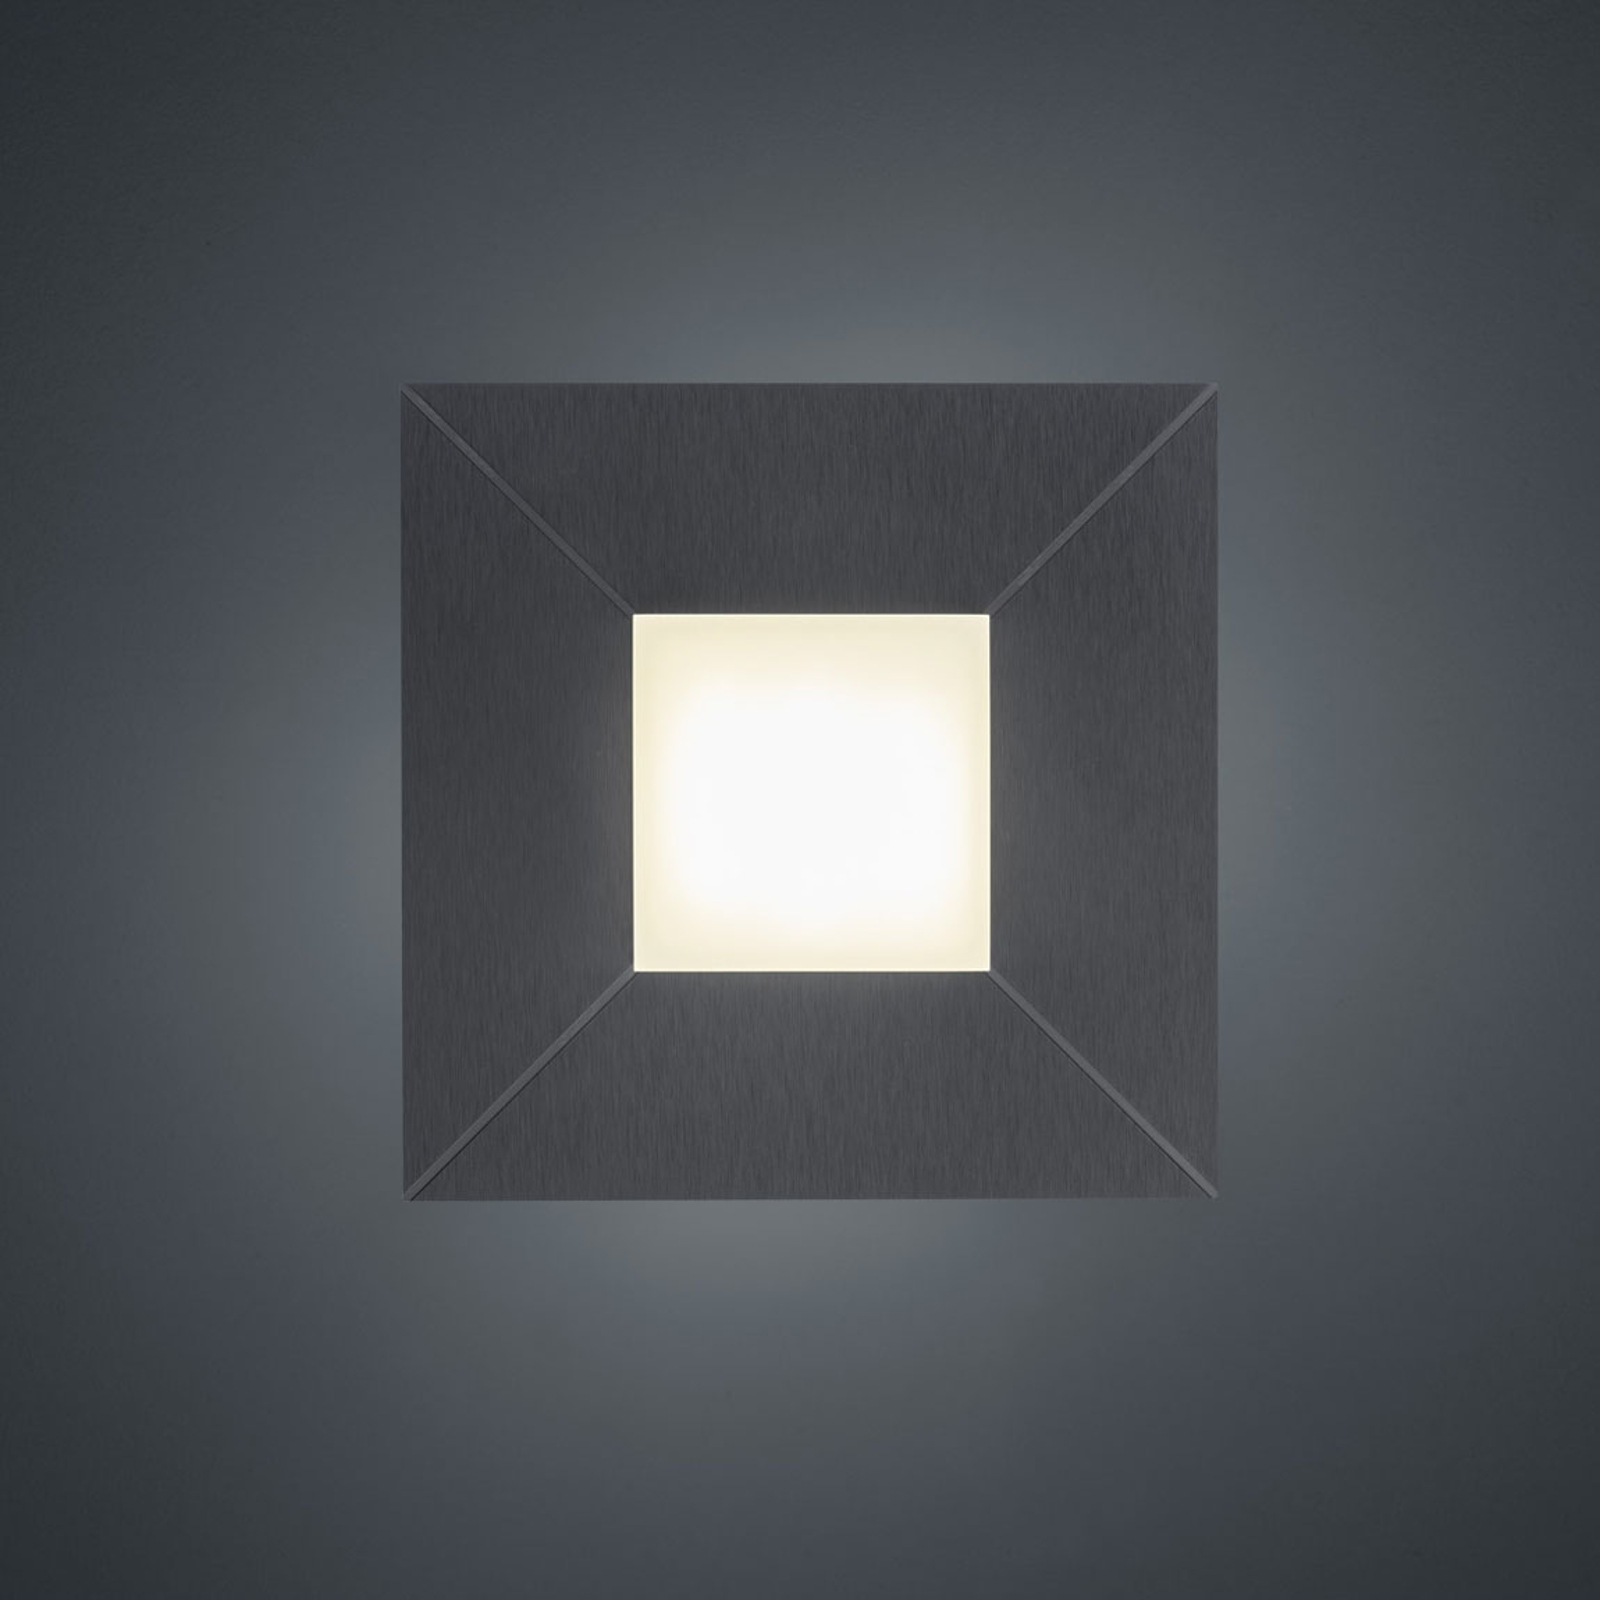 BANKAMP Diamond plafonnier 17x17cm, anthracite